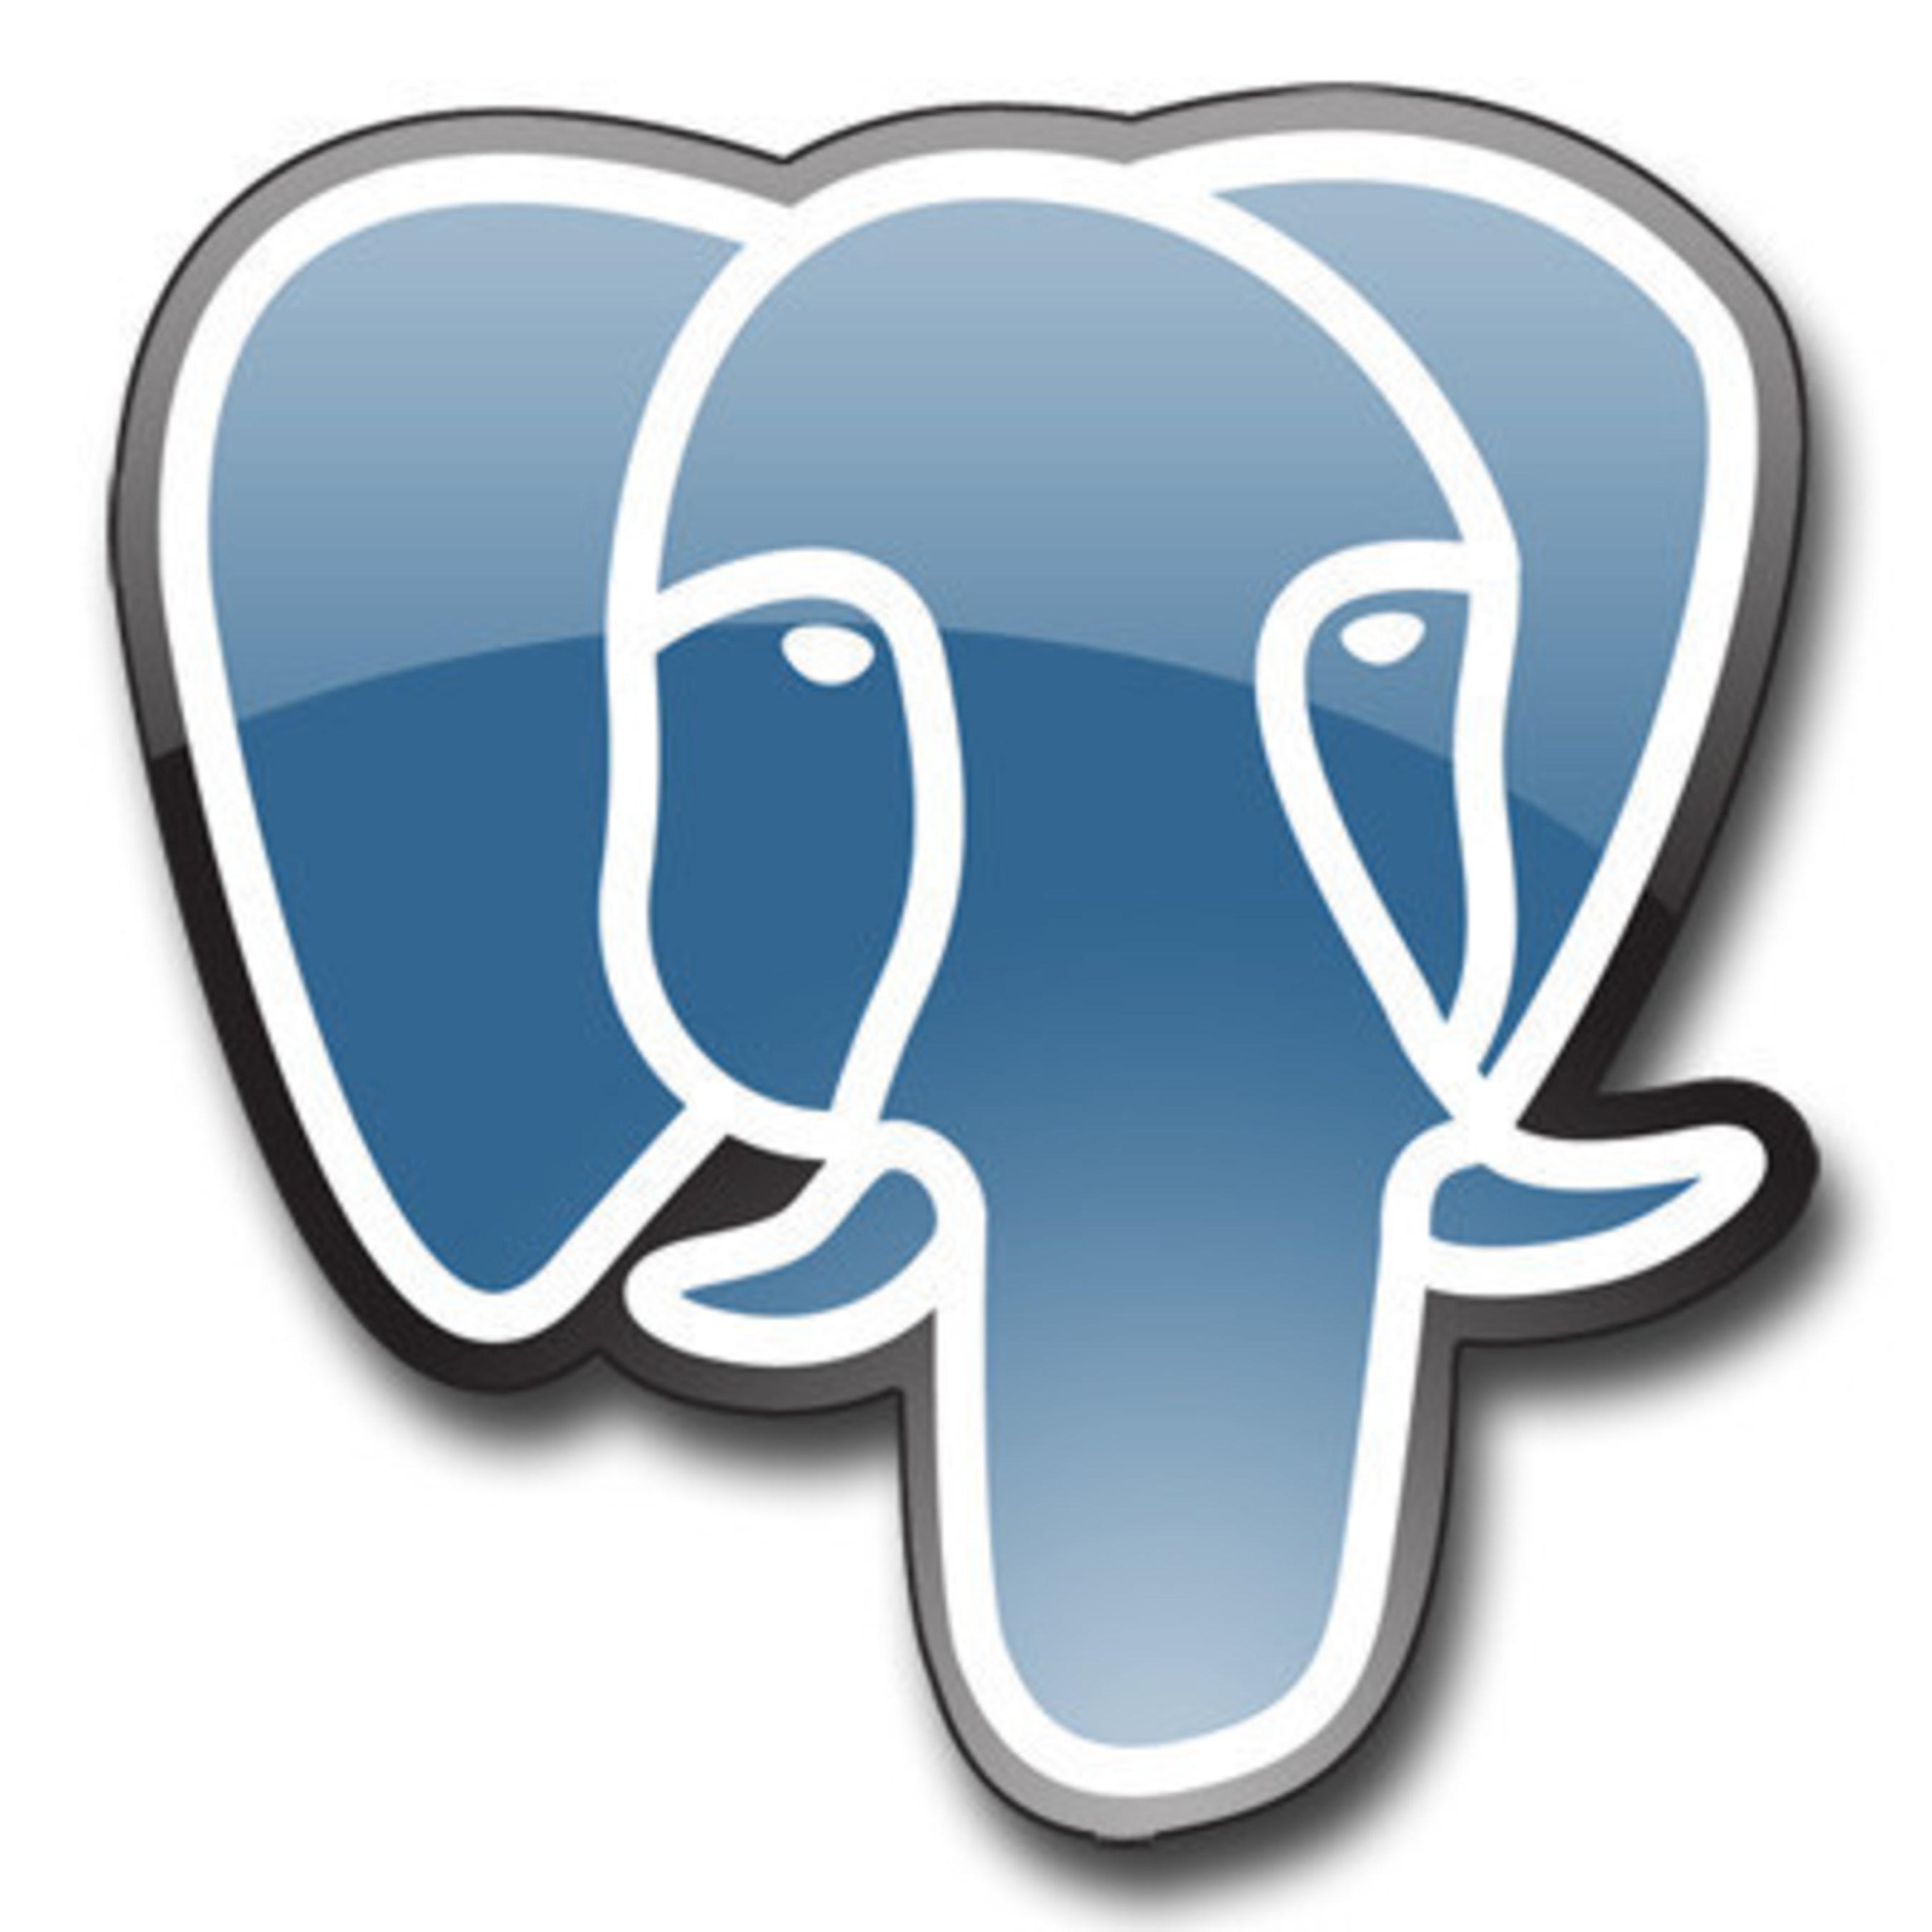 PostgreSQL 9.5: UPSERT, Row Level Security, and Big Data